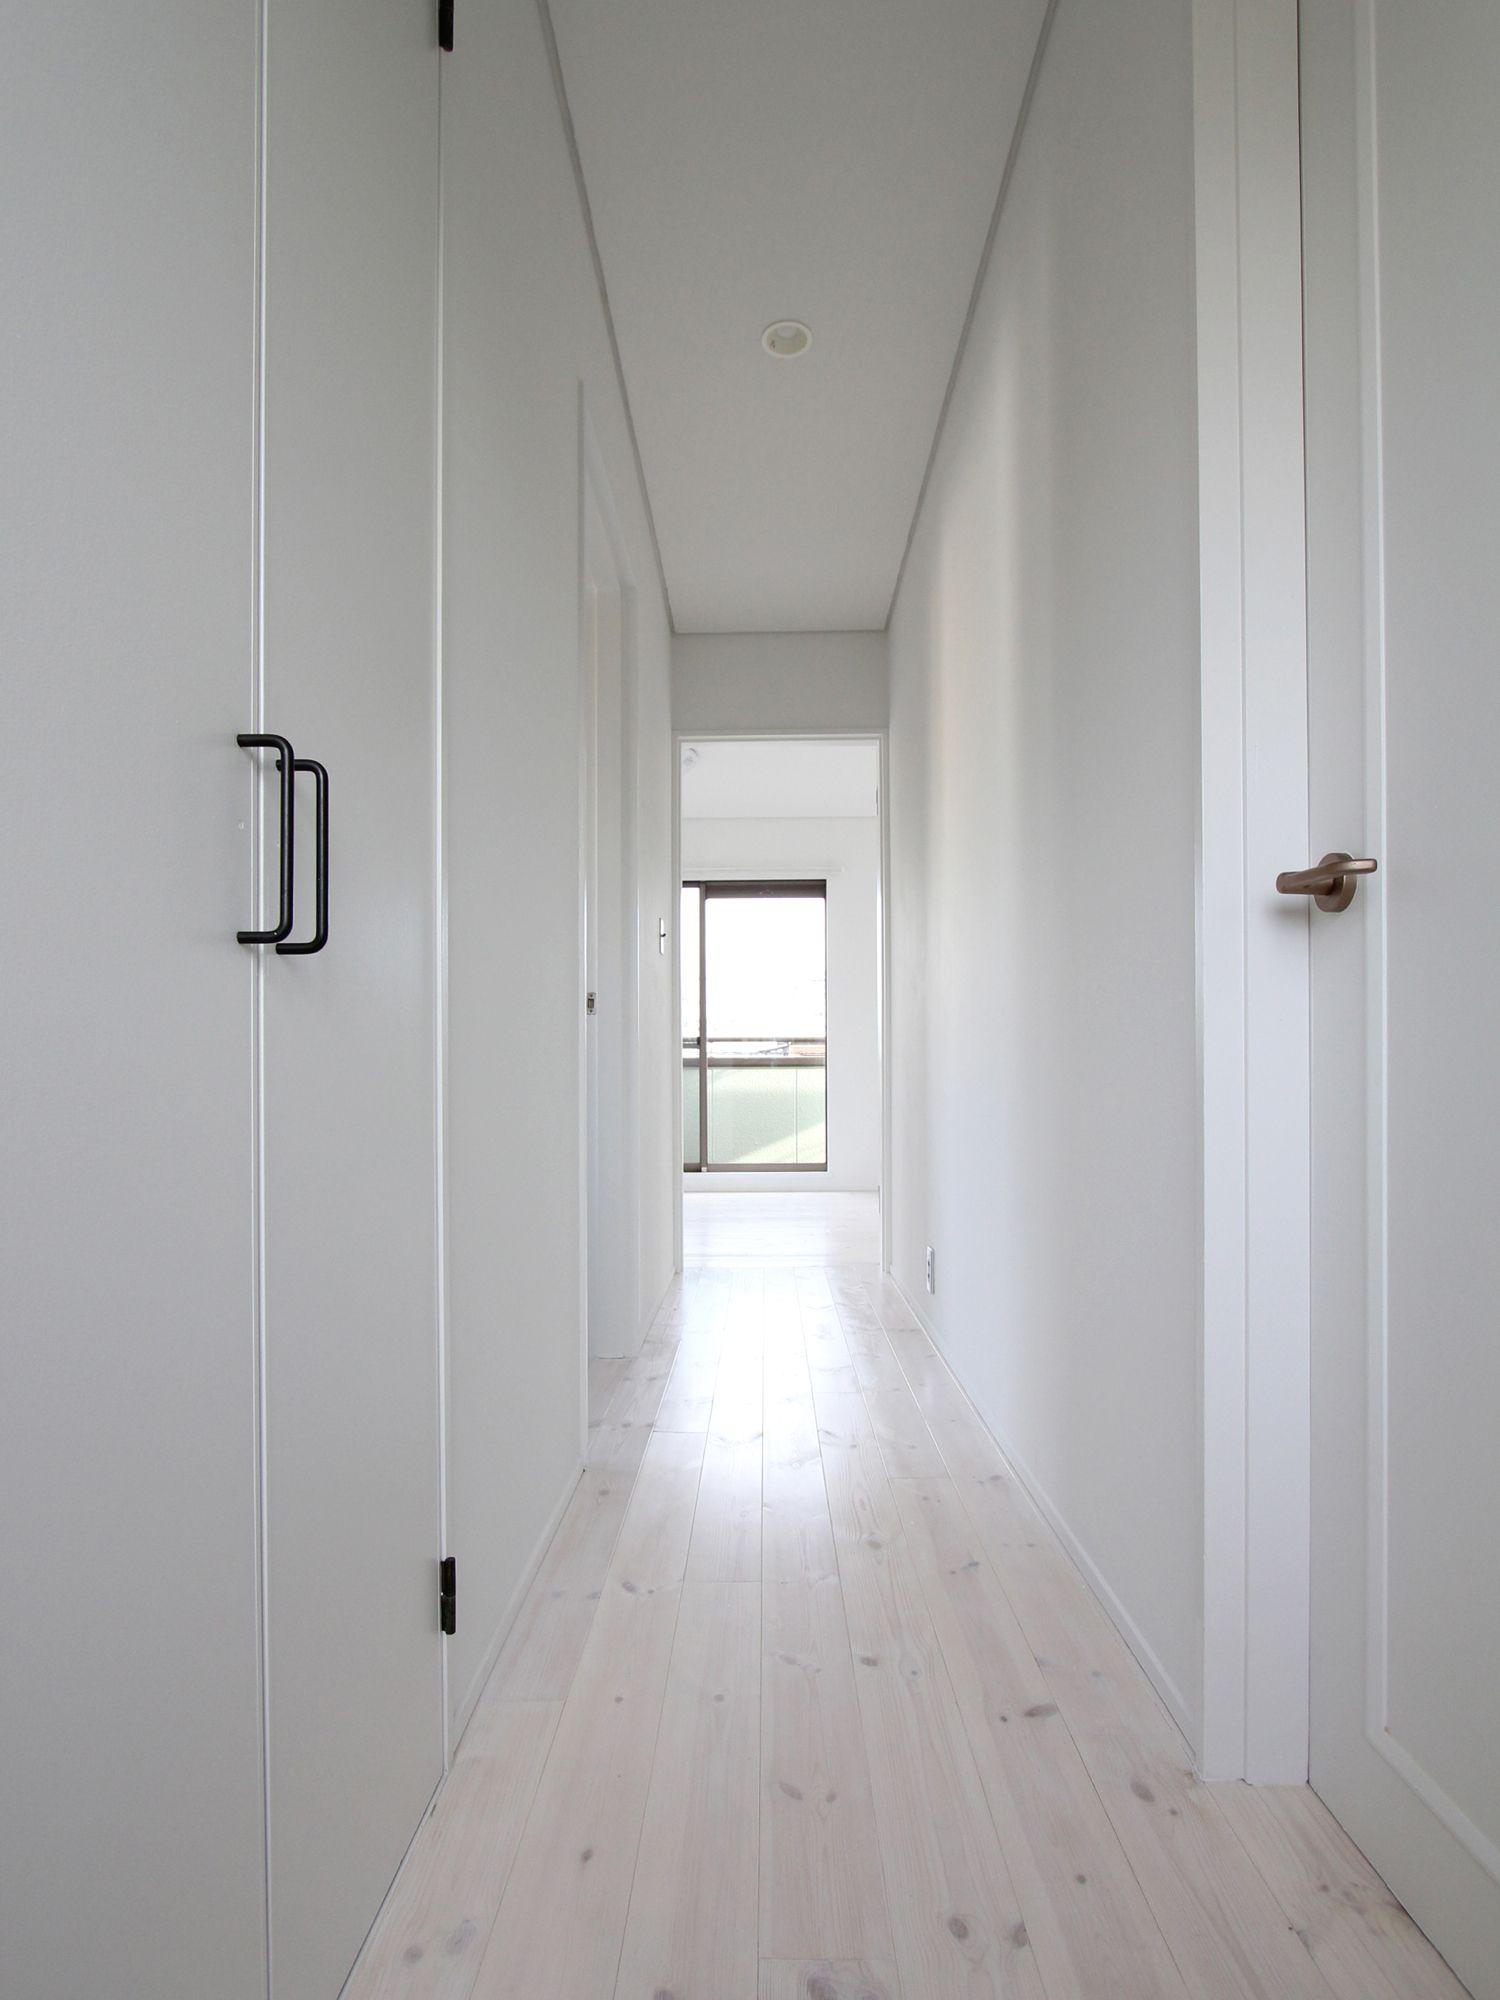 Flooring Floor White フローリング 床 廊下 白 フィールドガレージ